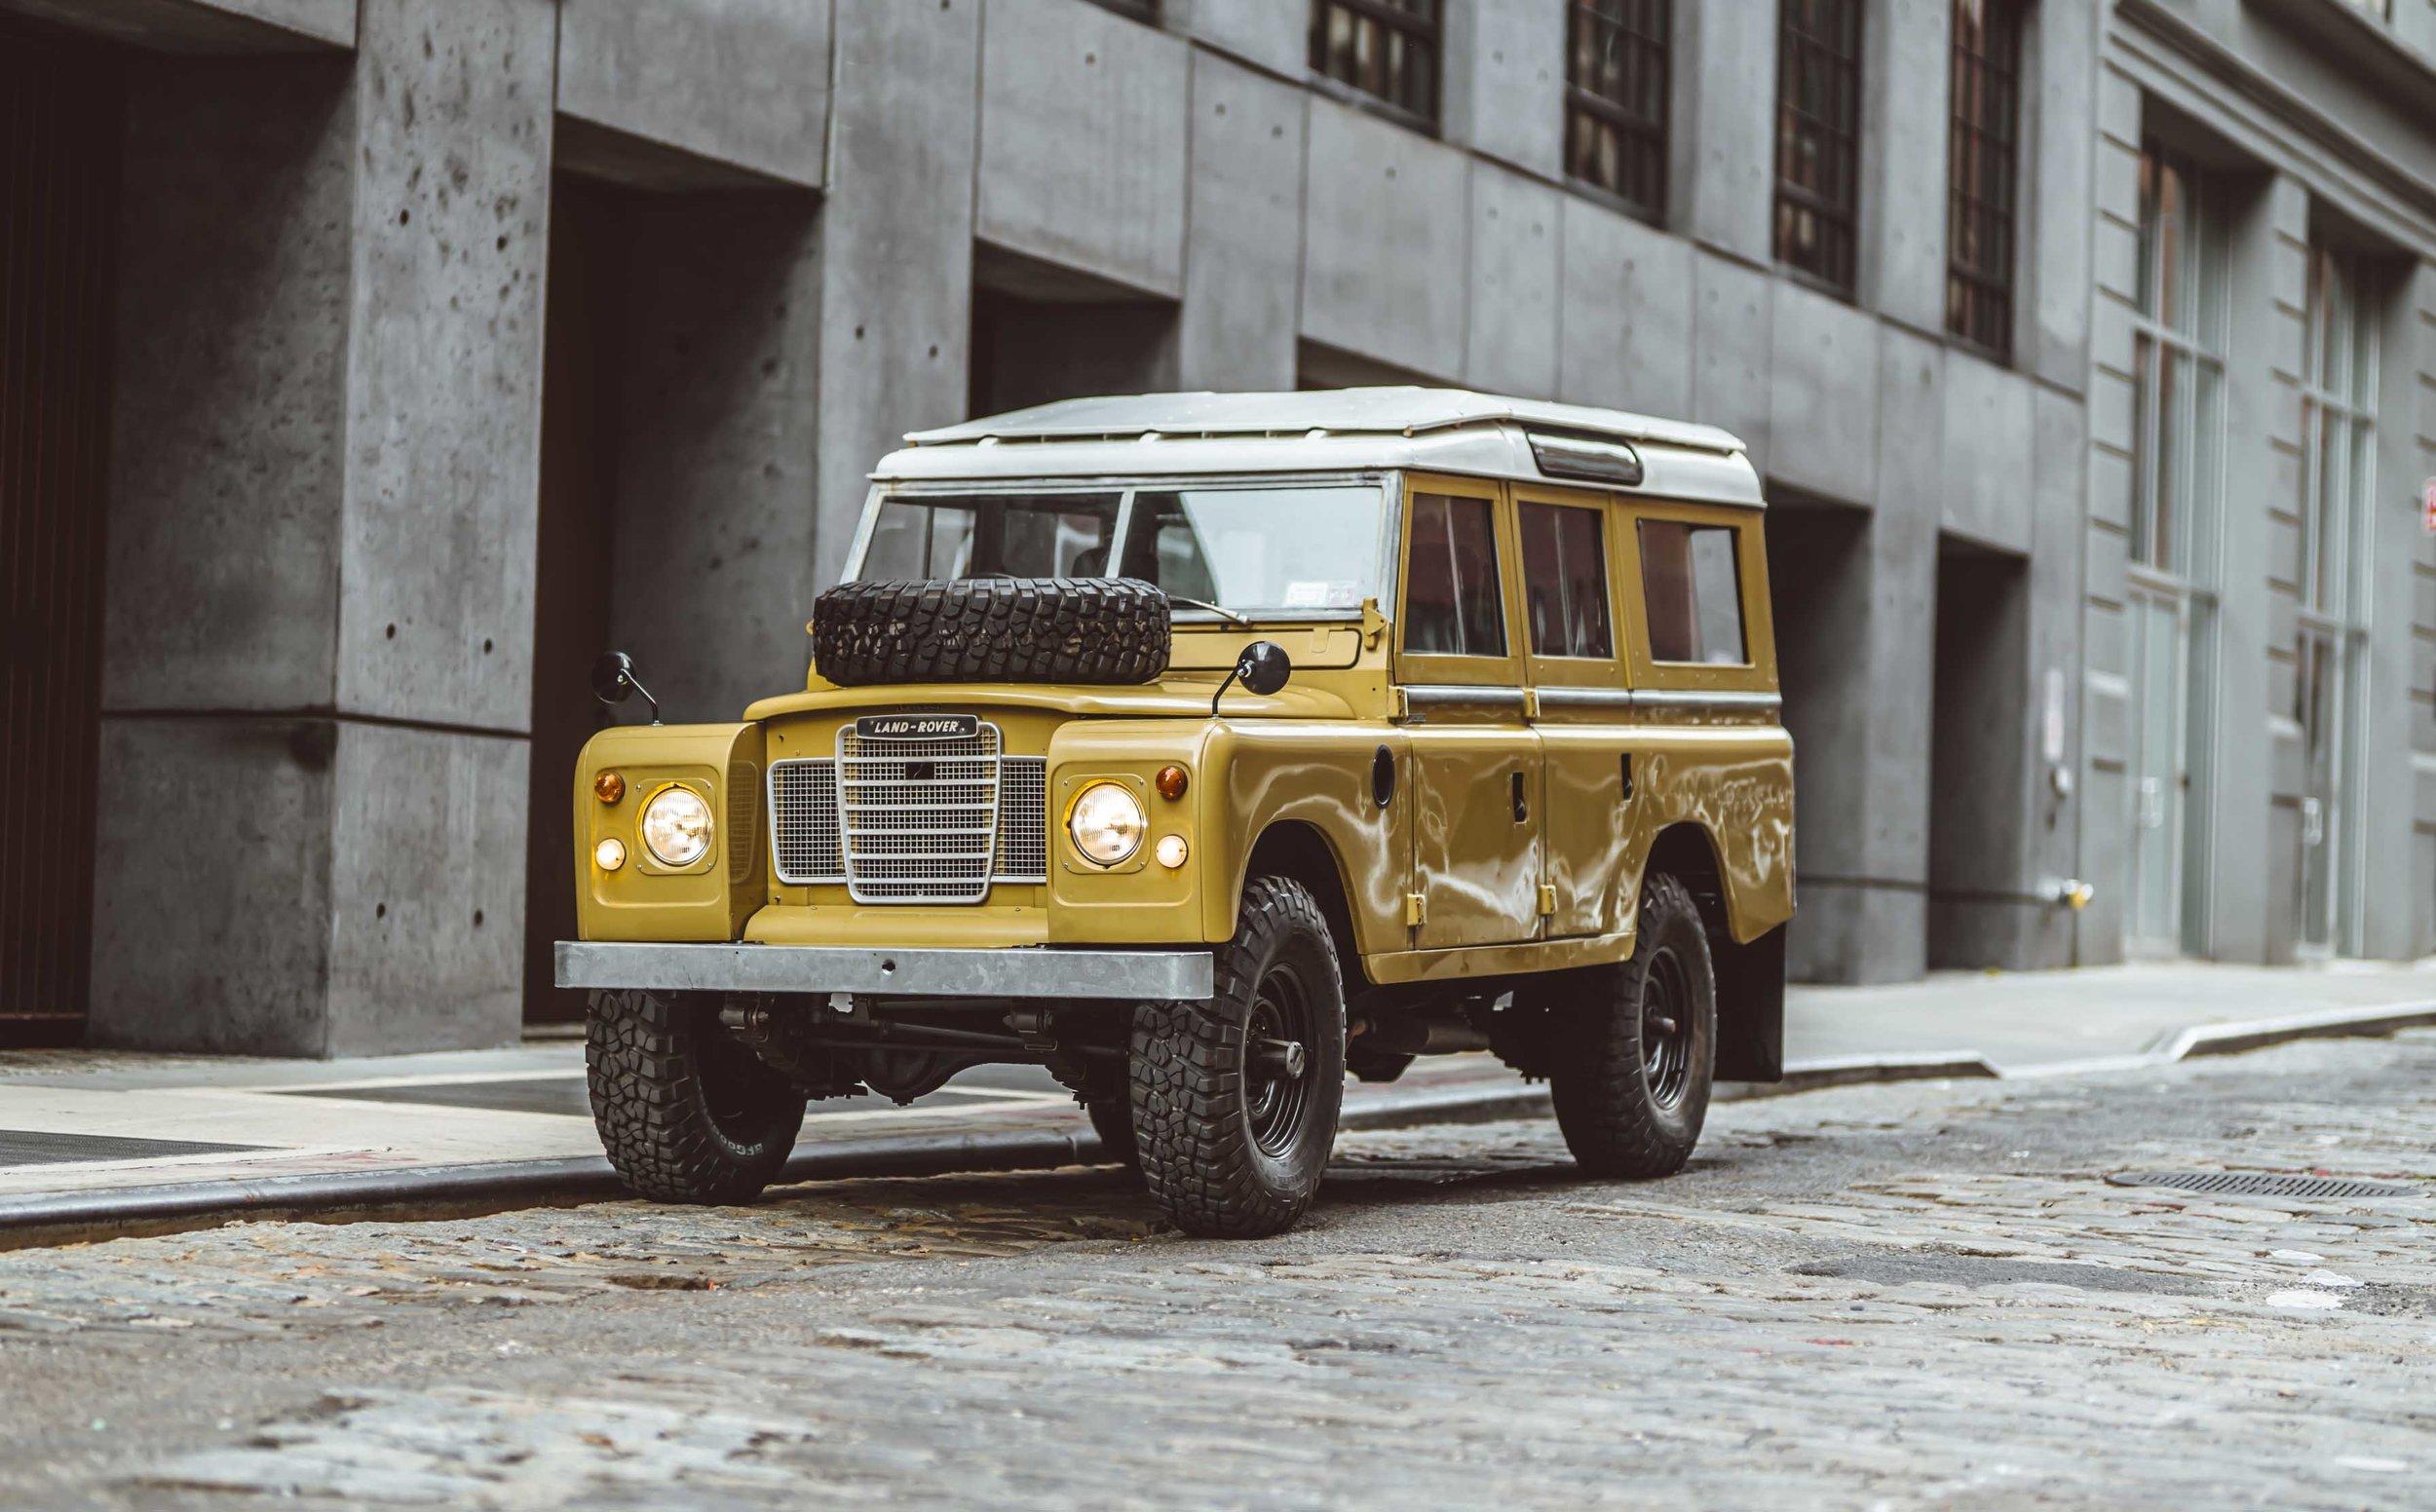 1975_Land_Rover_Series_III_109_Bahama_Gold_Large_0007_Layer 23.jpg